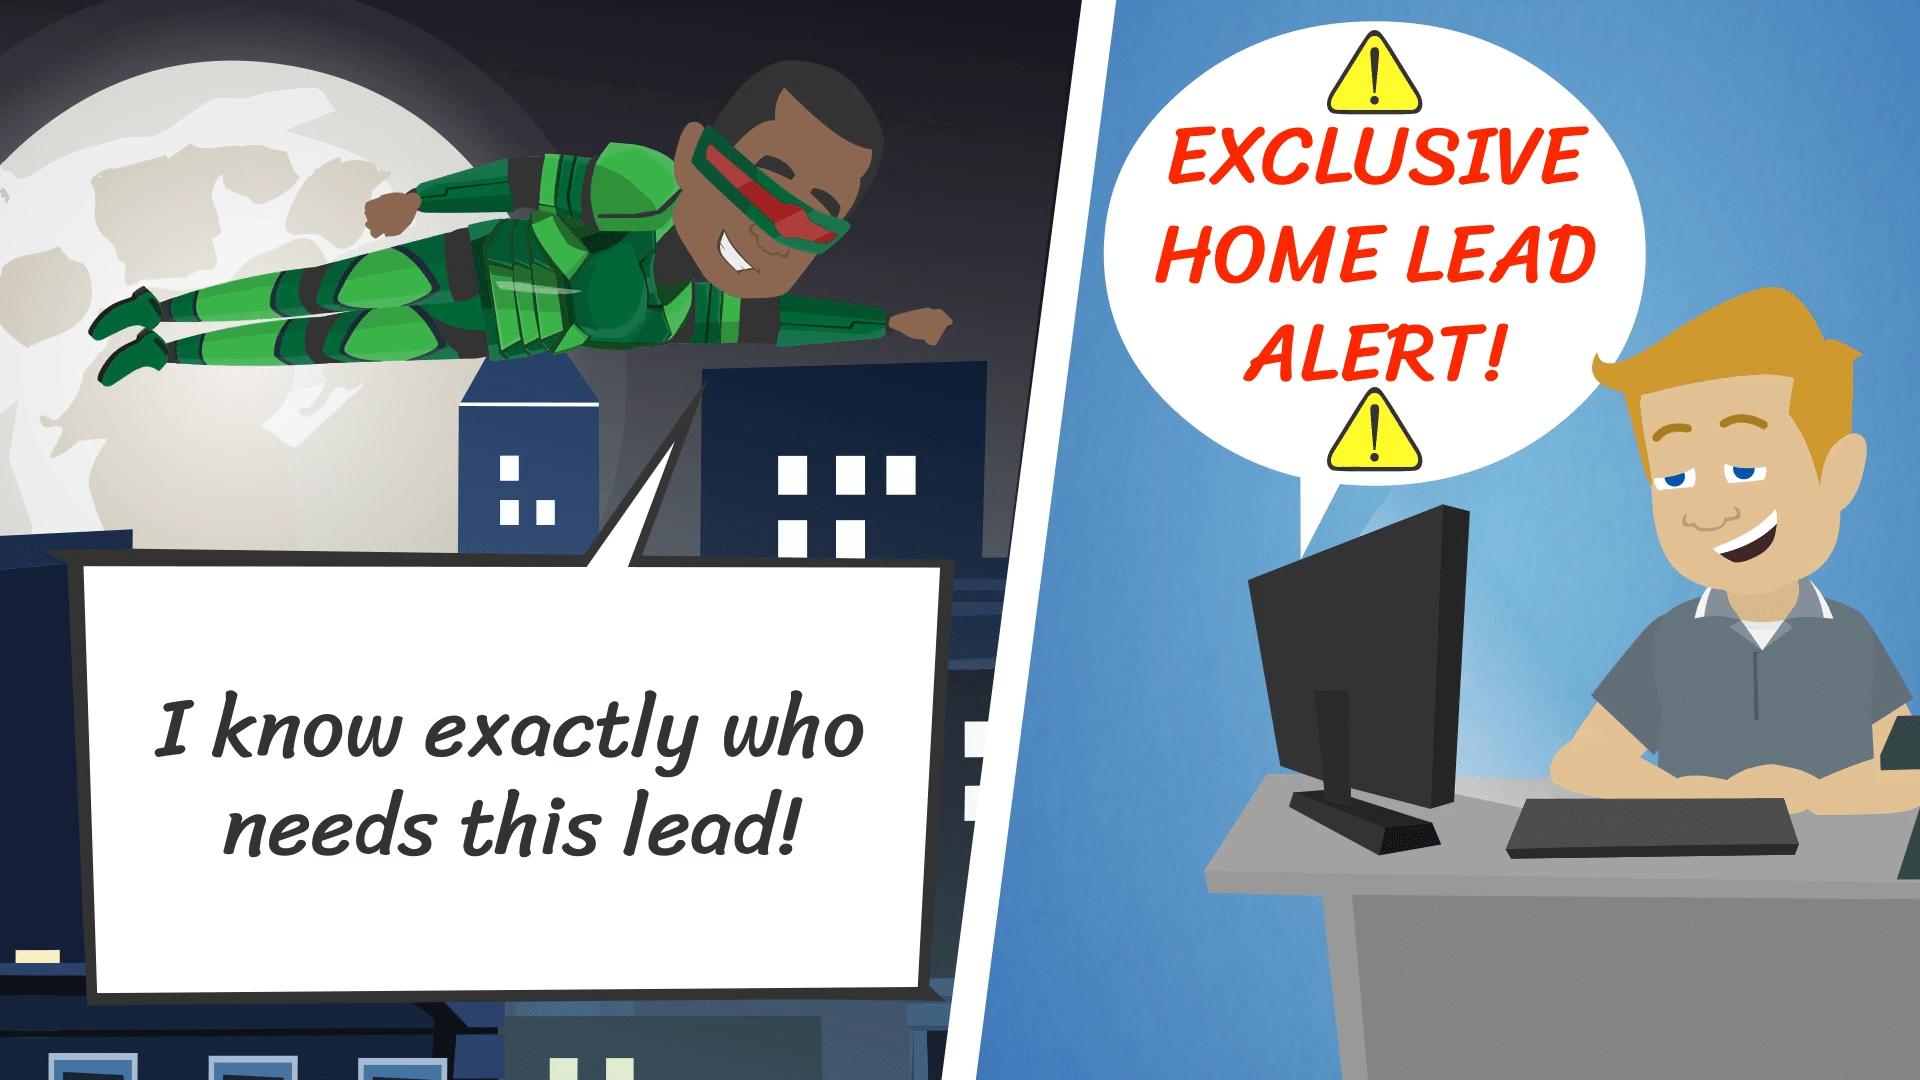 Exclusive Home Lead Alert